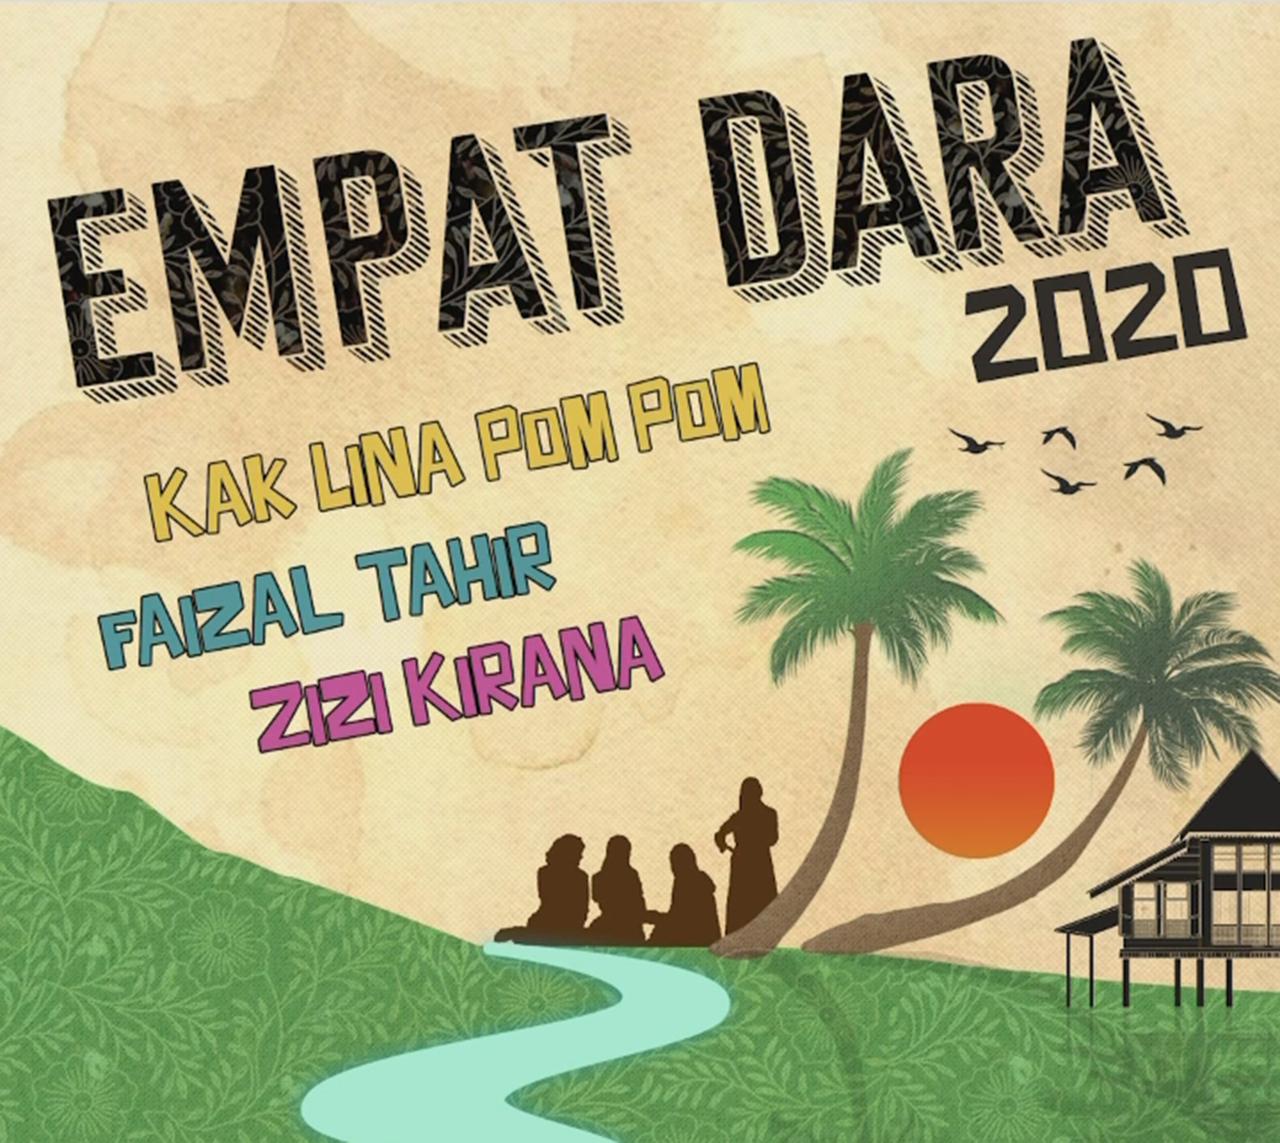 Lagu Empat Dara 2020 Versi Elly Mazlein, Faizal Tahir & Zizi Kirana